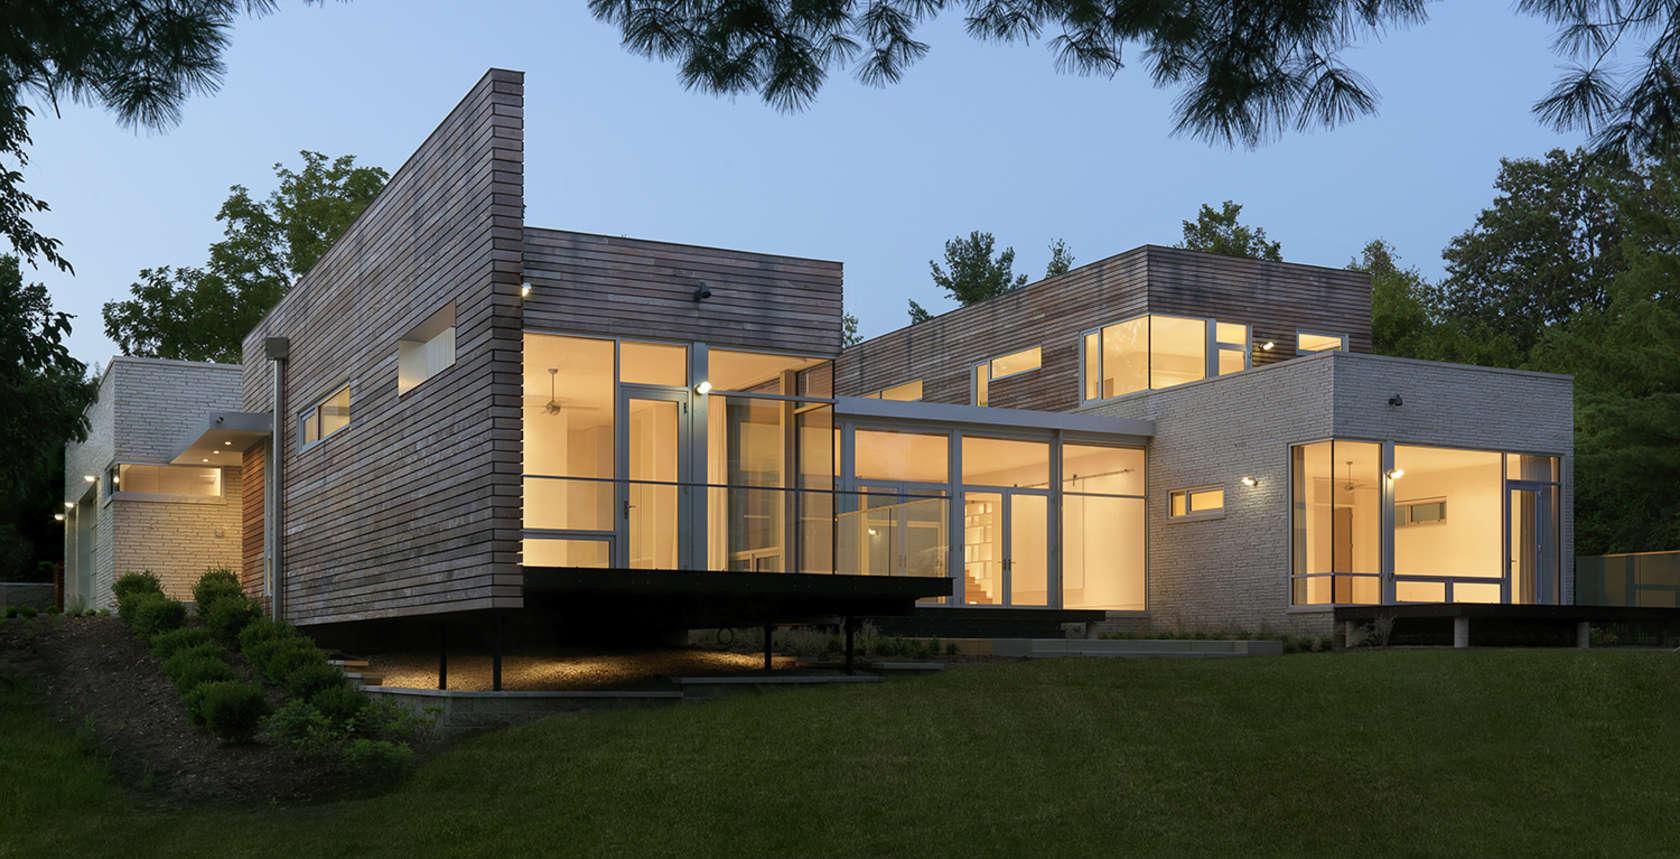 Impressionnante maison contemporaine l for Architecture contemporaine maison